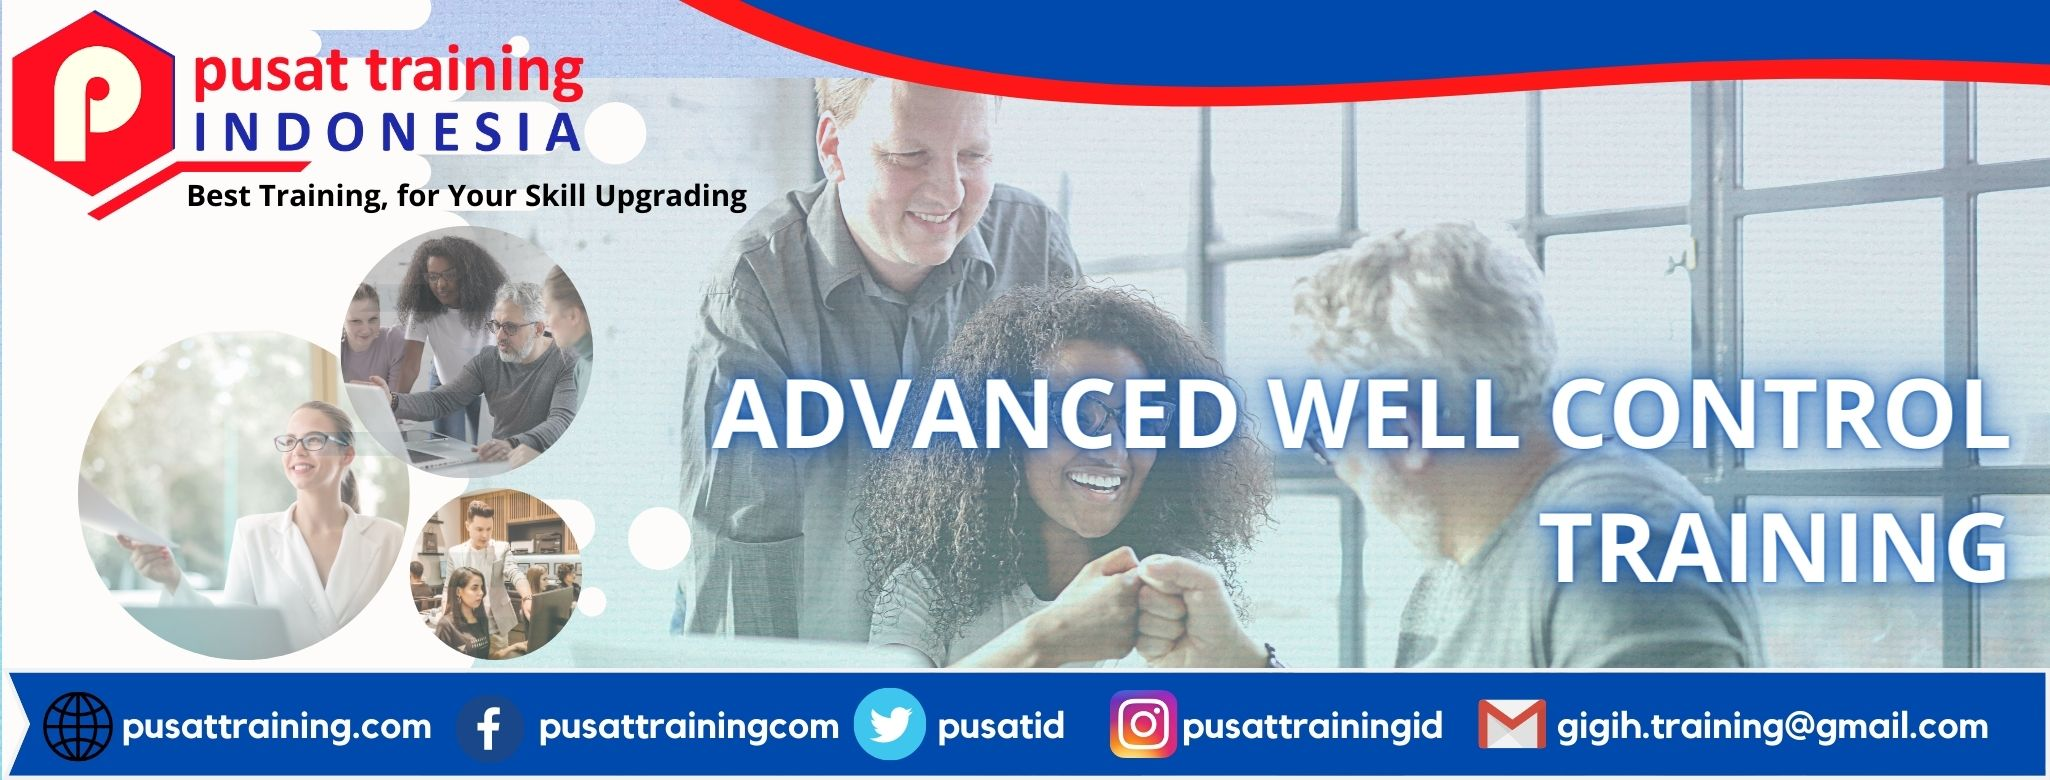 advance-well-control-training